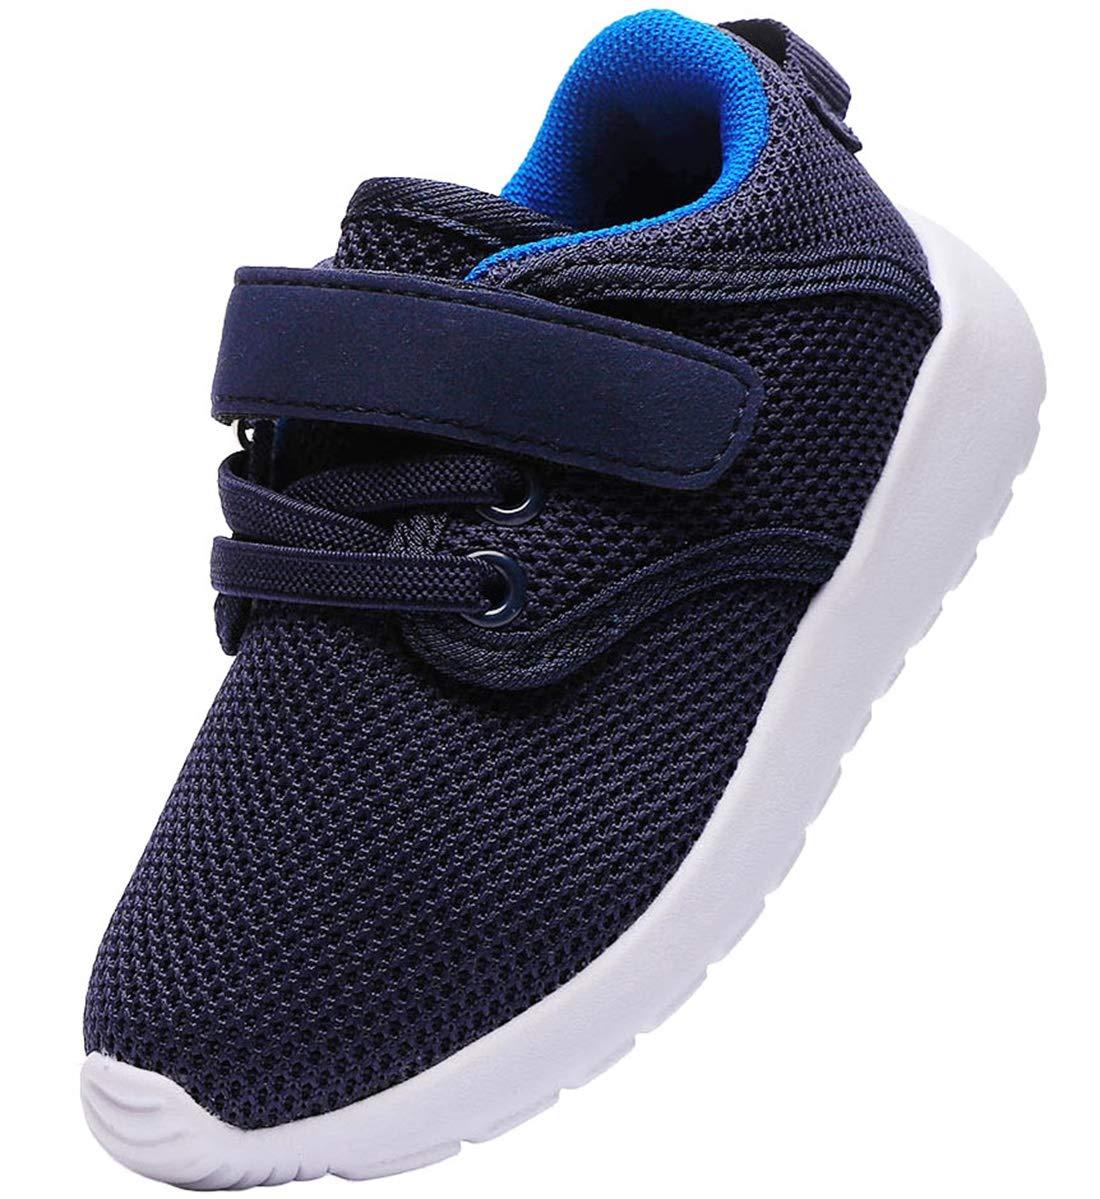 PPXID Boy's Girl's Breathable Mesh Hoop Loop Casual Sneaker Running Shoes-Blue 7.5 US Toddler